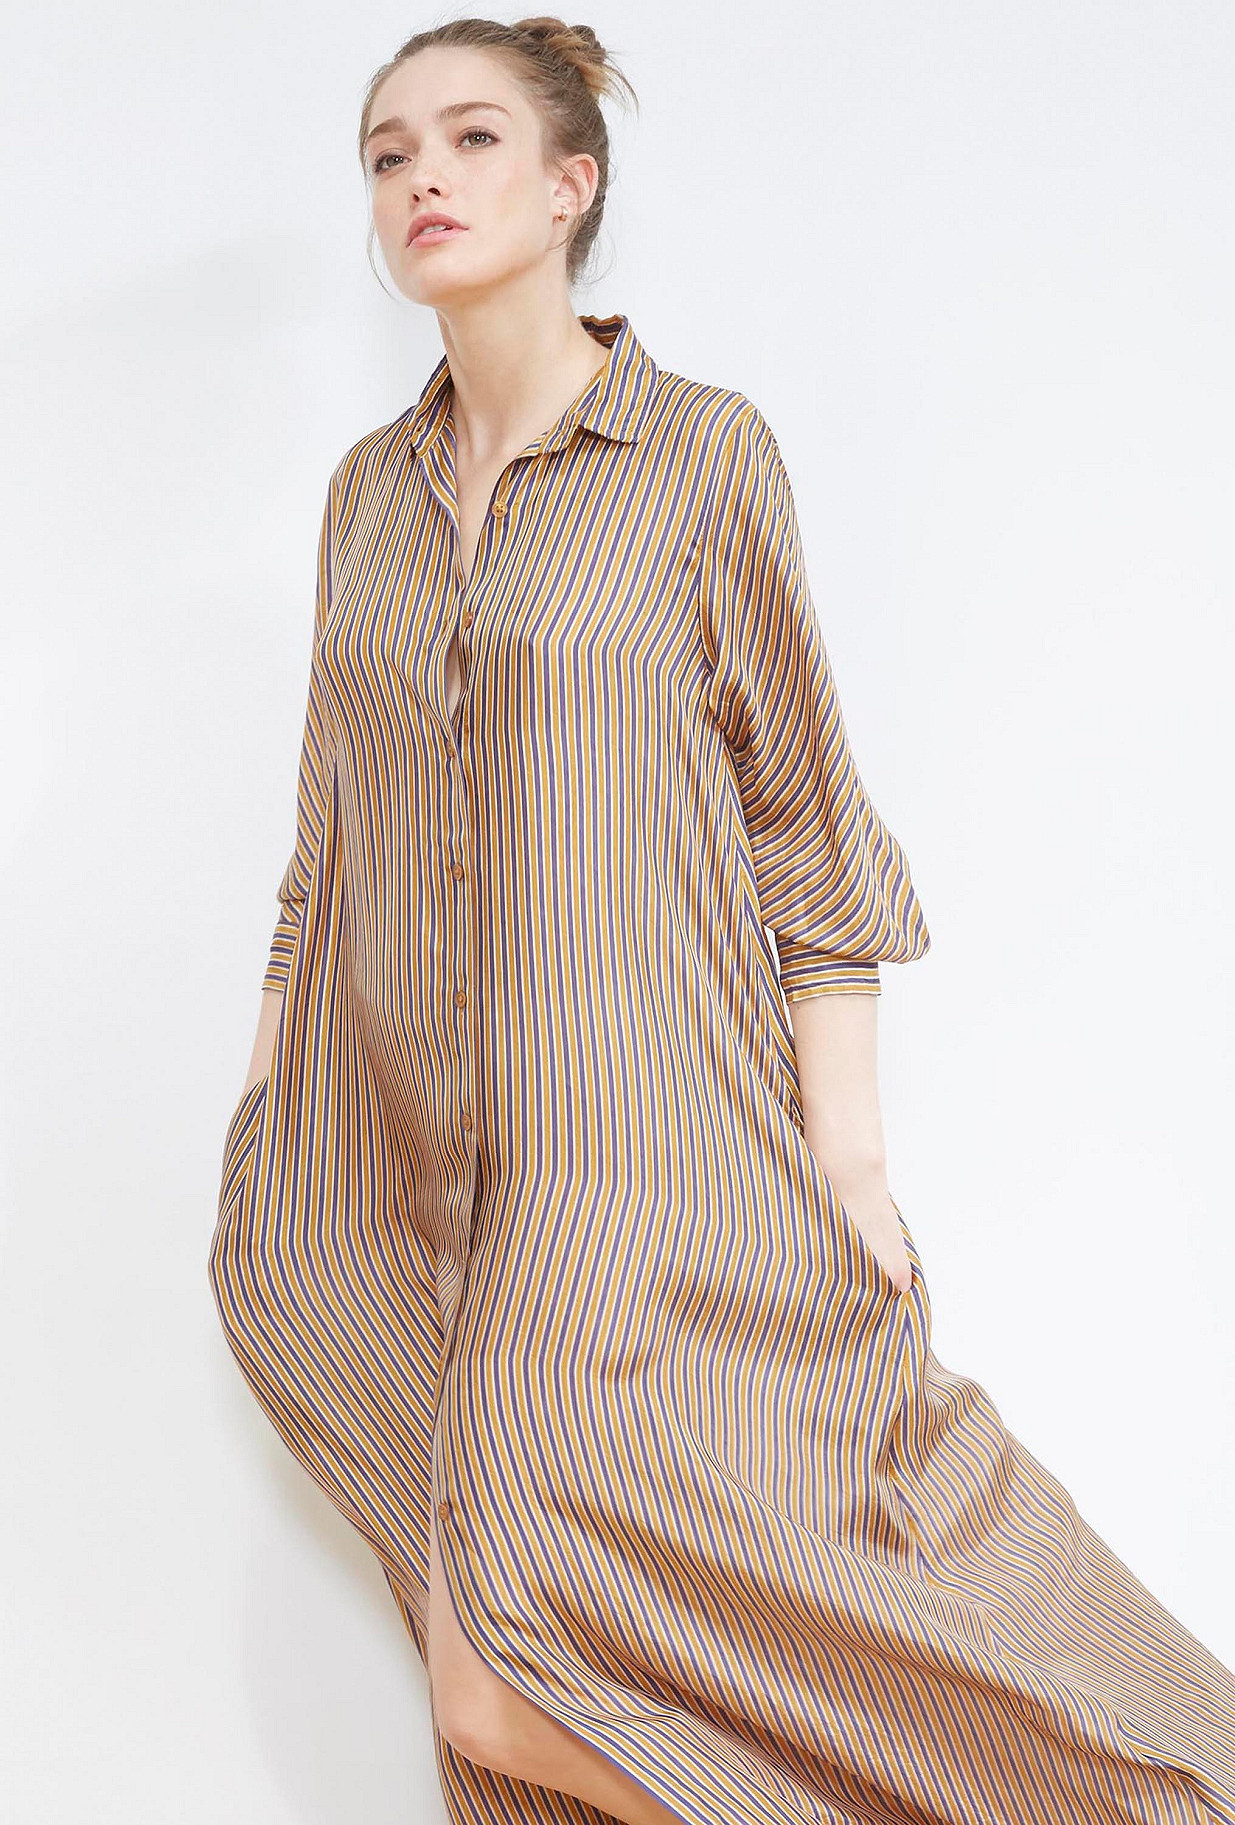 clothes store DRESS  Breedys french designer fashion Paris